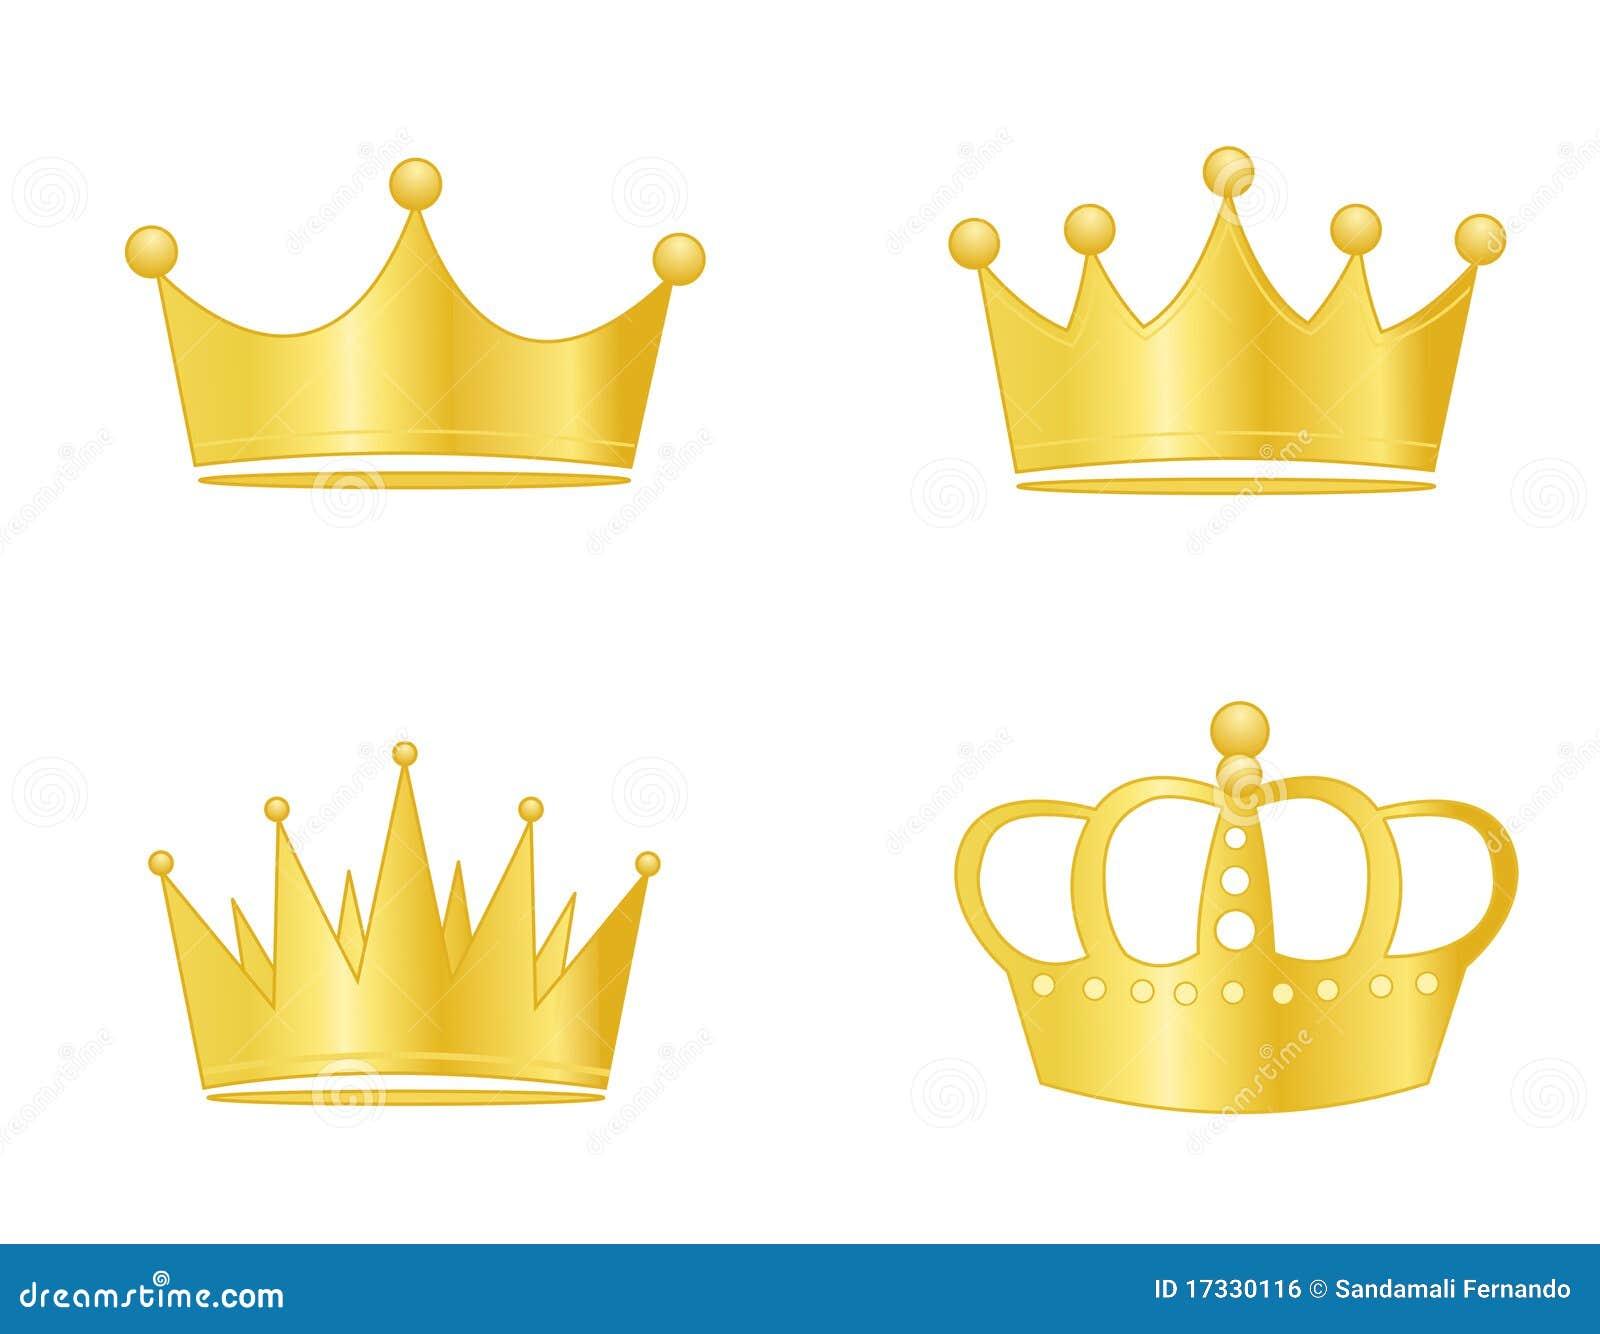 Queen Crown Logo Crown gold